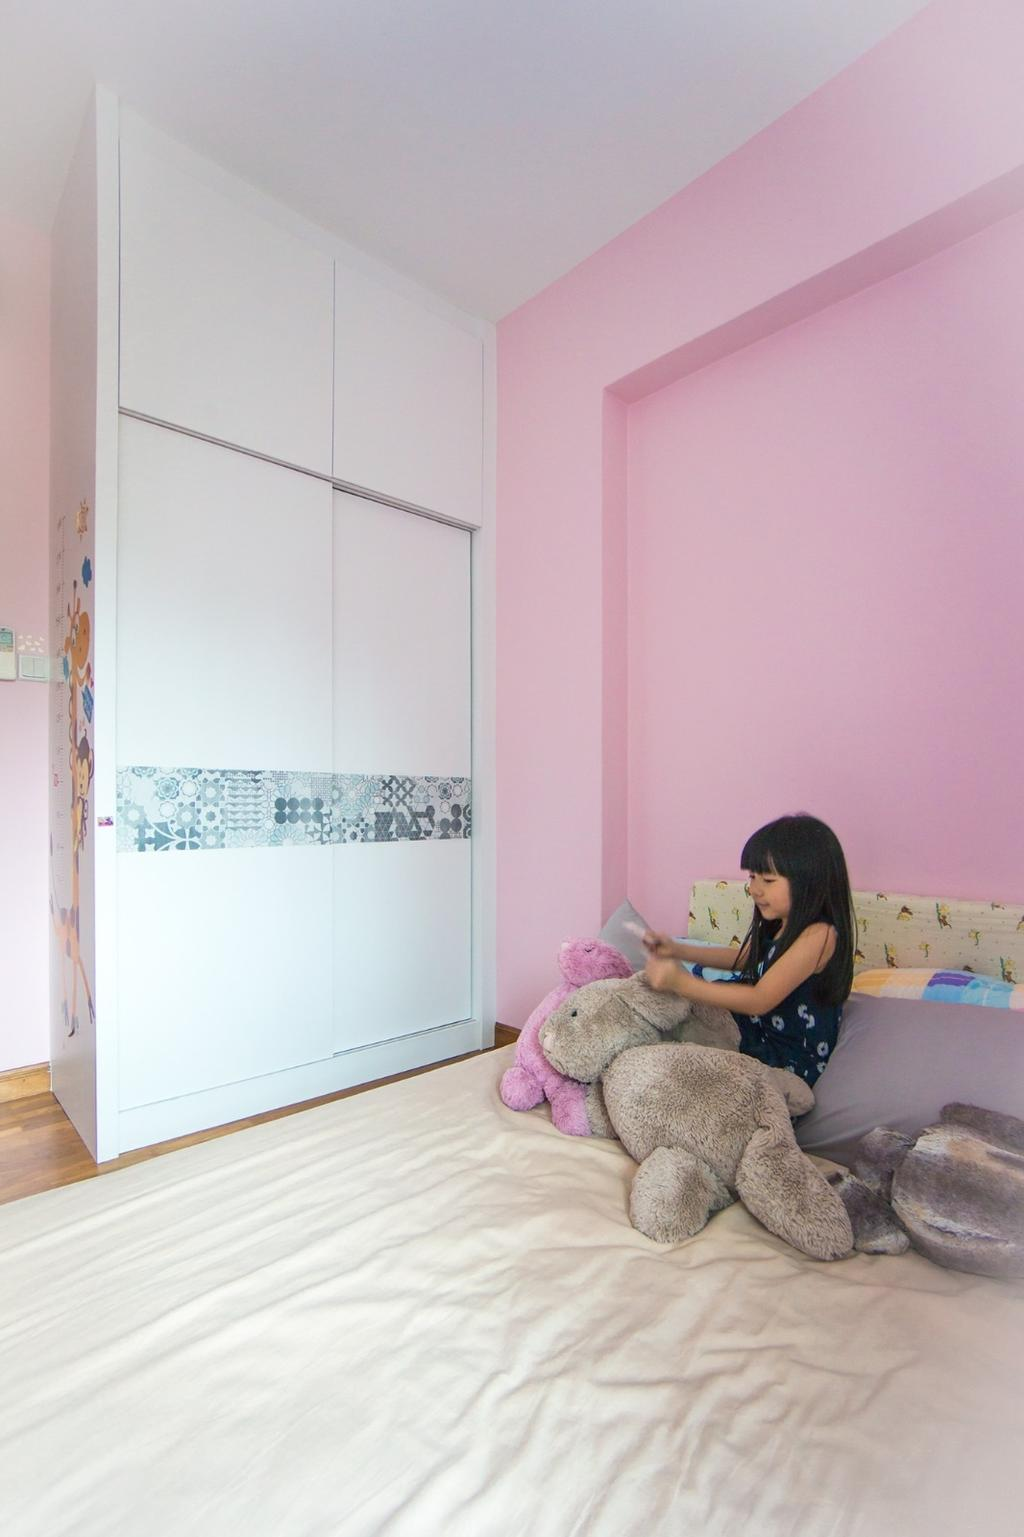 Transitional, Condo, Bedroom, Palm Gardens, Interior Designer, Flo Design, Human, People, Person, White Board